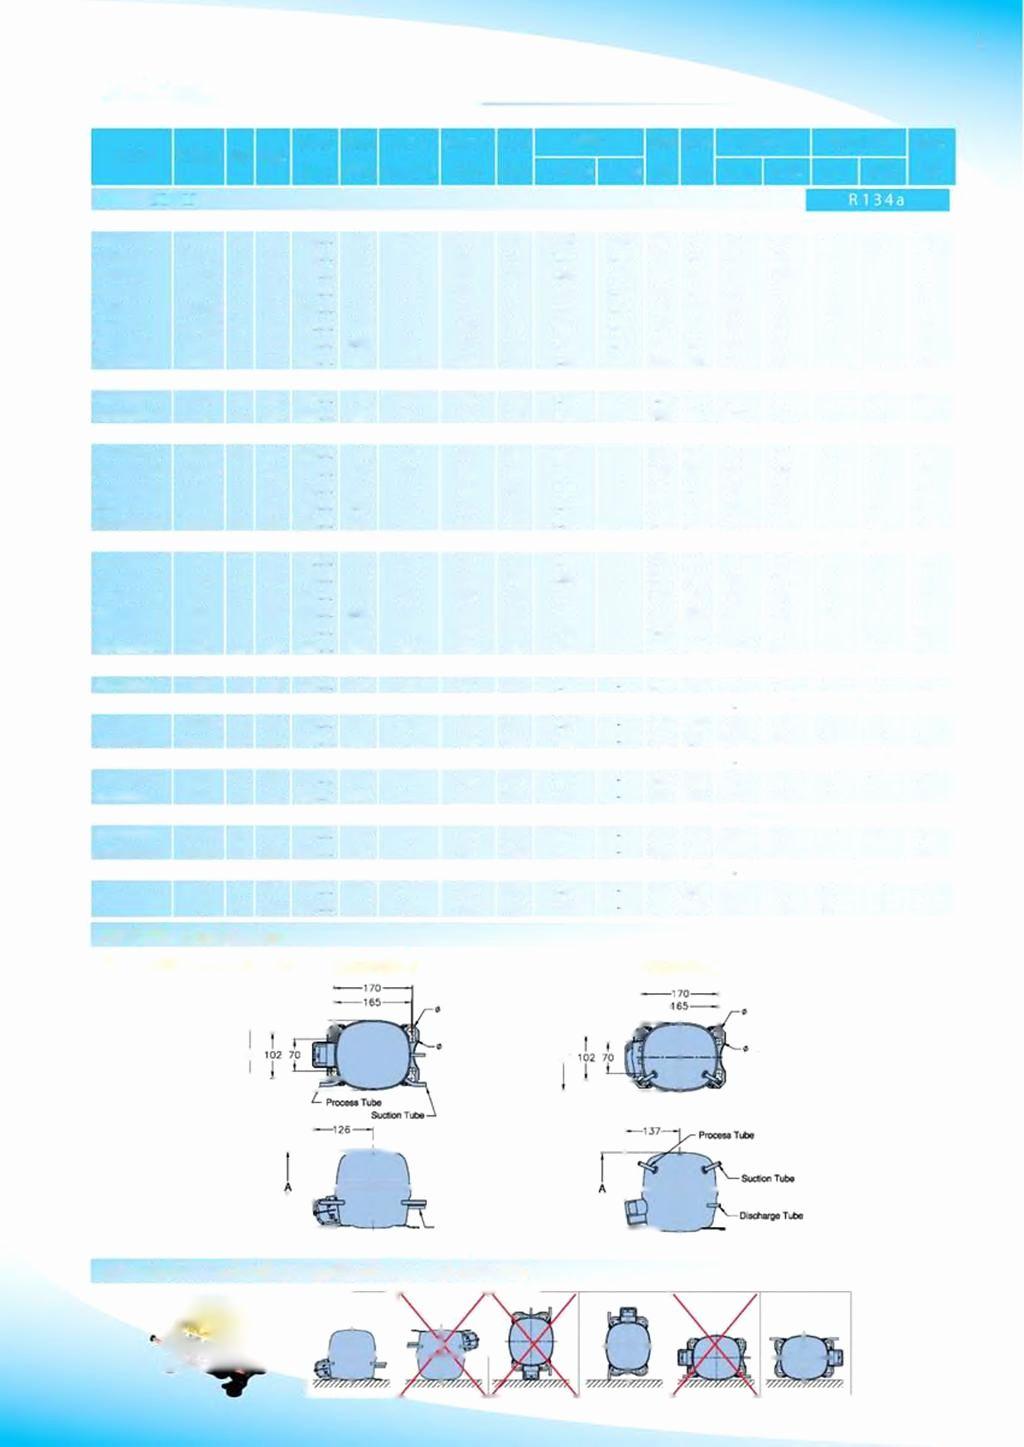 Wiring Diagram Compressor Capacitor Start Capacitor Run Fractional - Capacitor Start Capacitor Run Motor Wiring Diagram